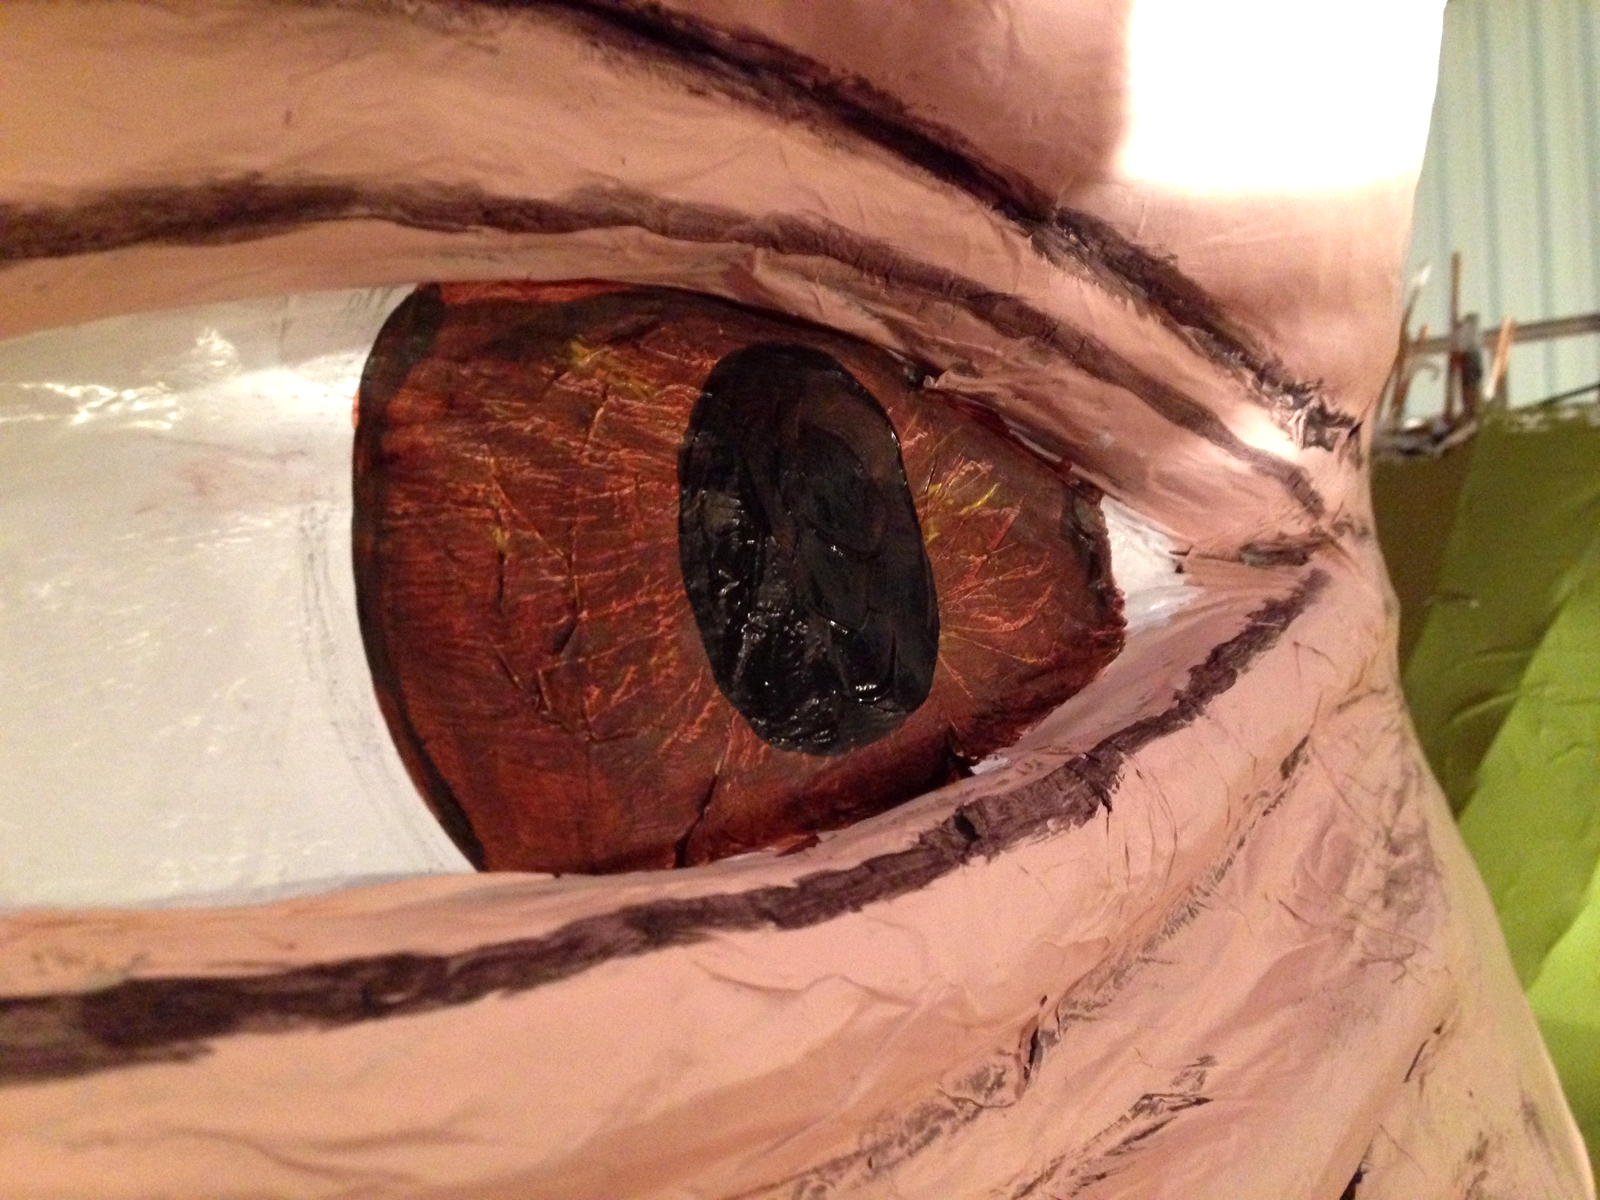 Eye detail.